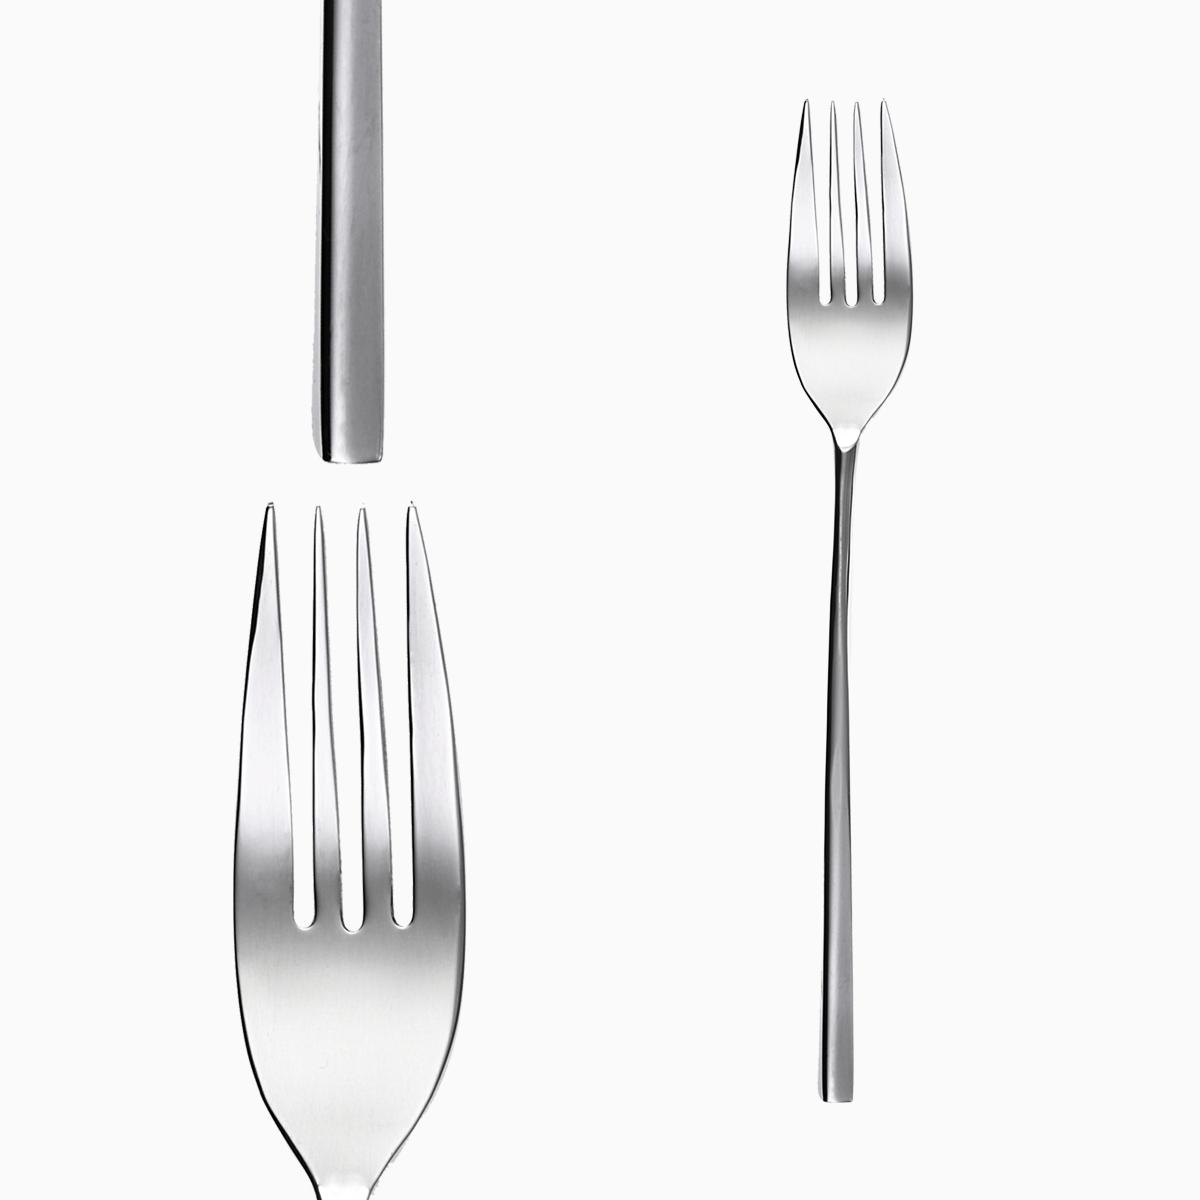 Table fork - MC Rino